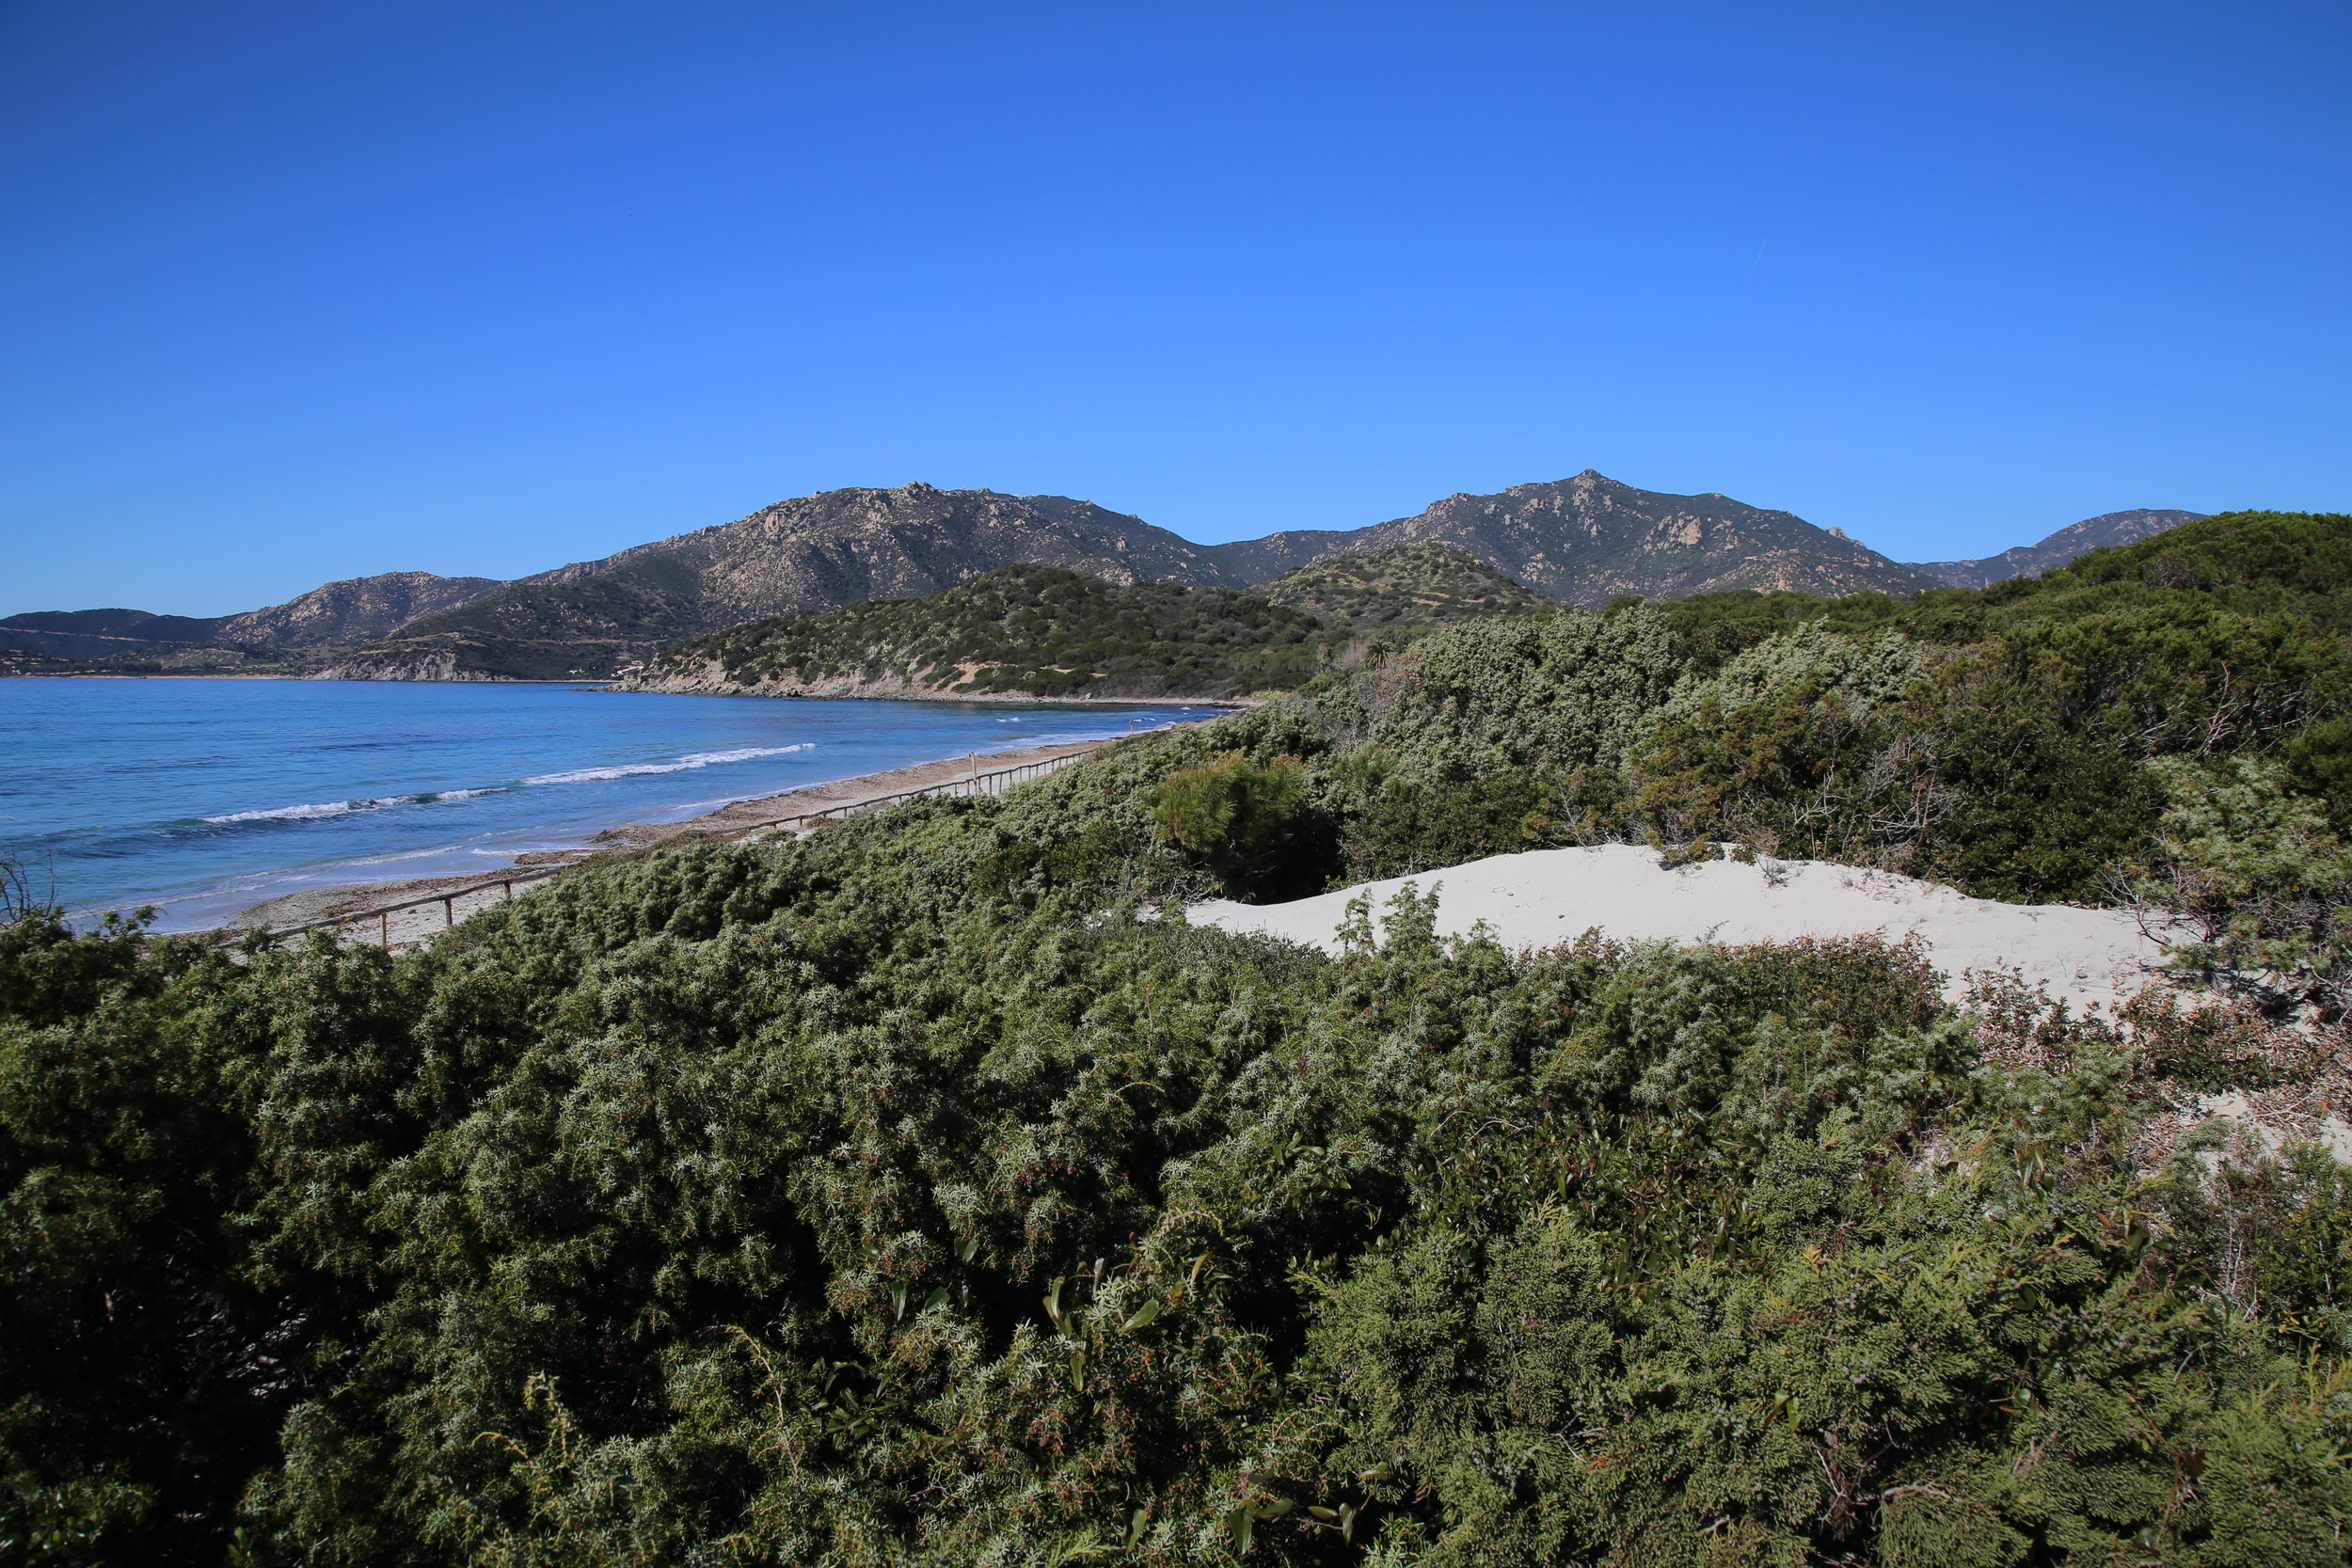 The Site of Community Importance  Isola dei Cavoli, Serpentara, Punta Molentis e Campulongu